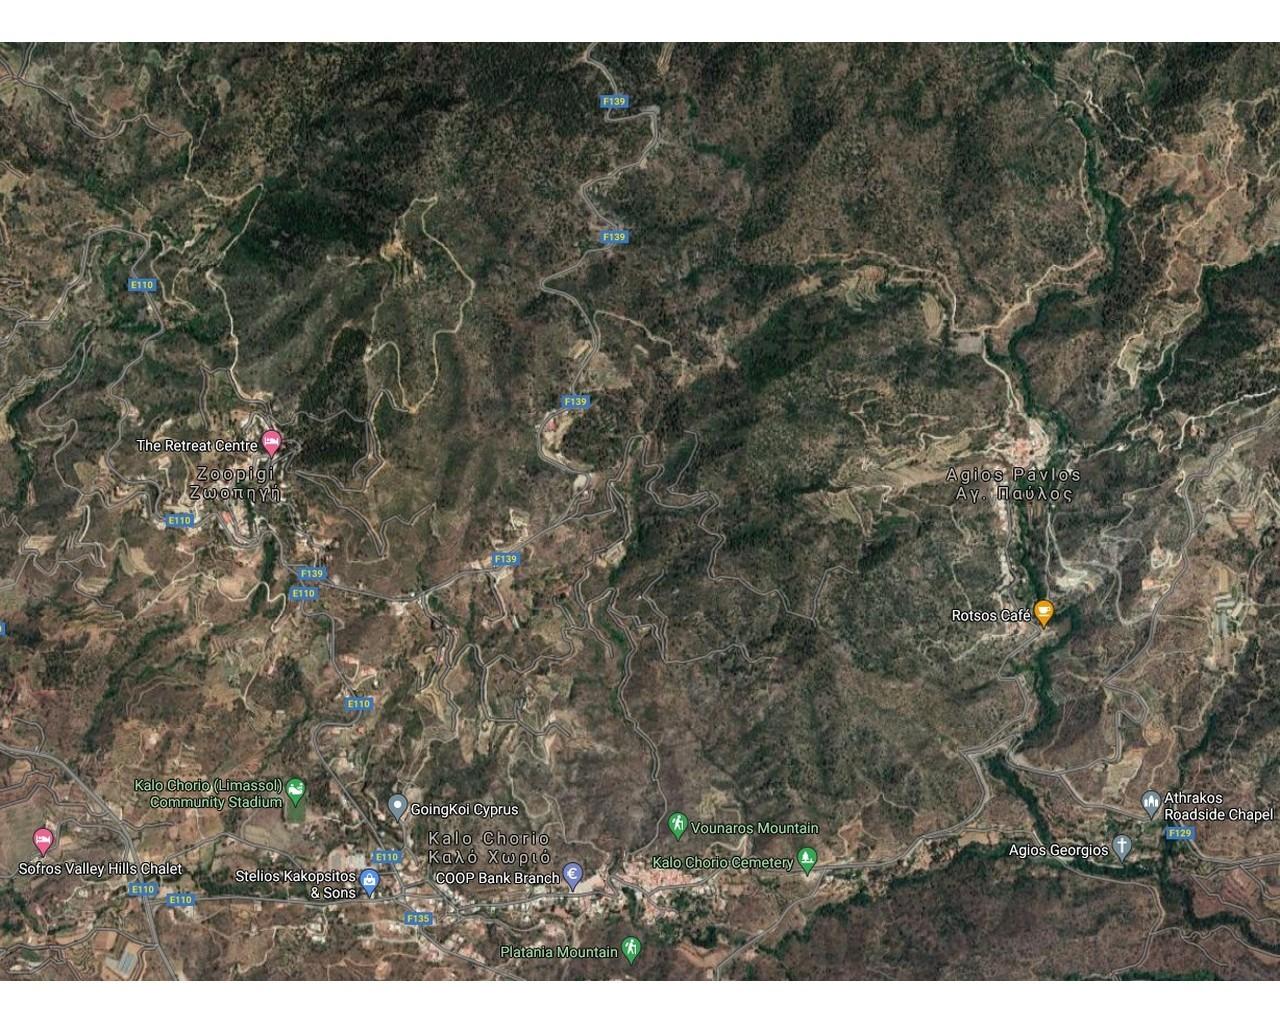 Land Limassol(AGIOS PAVLOS)  11595 SqMt for sale